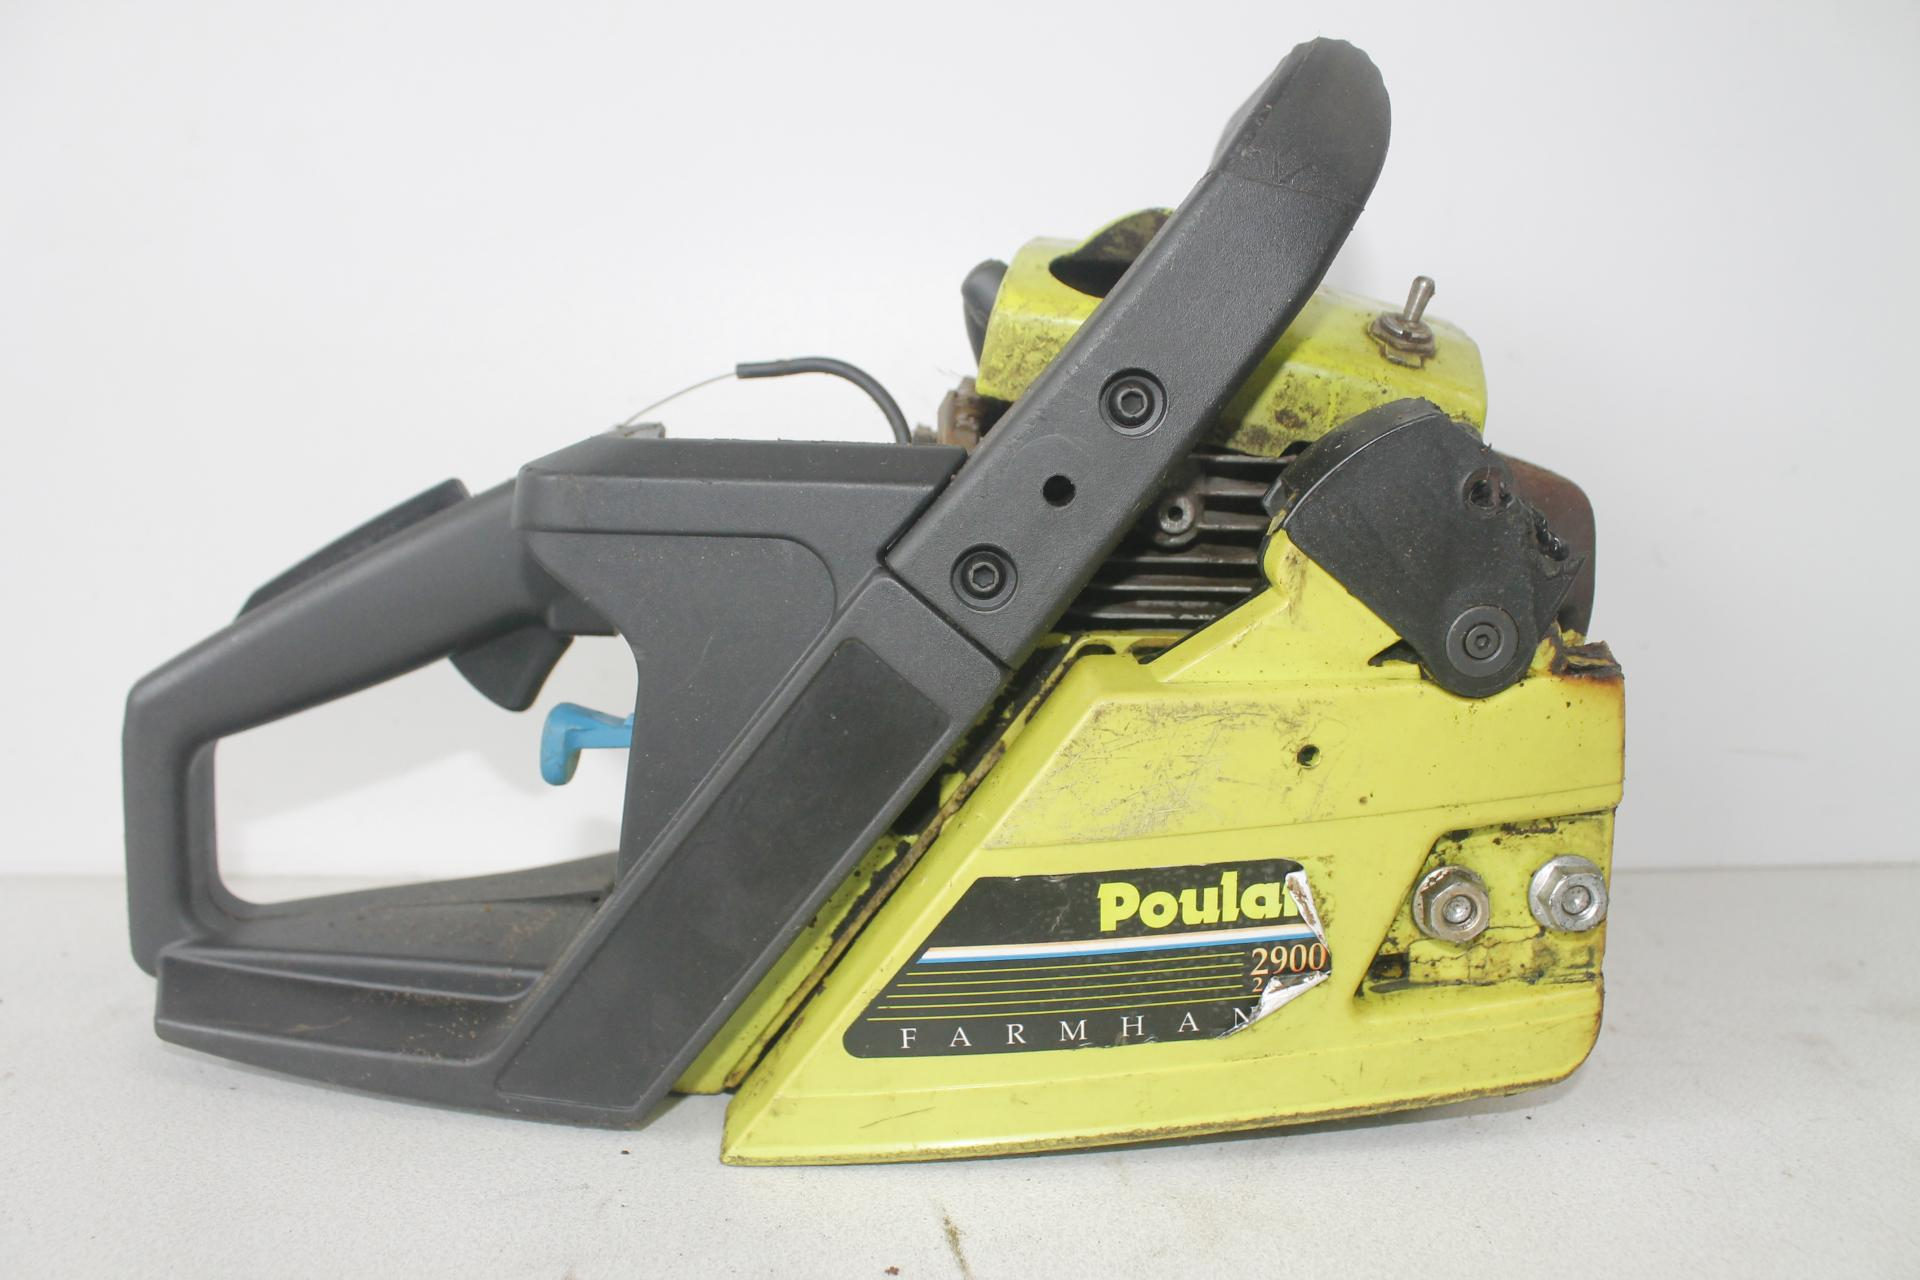 Despiece Poulan 2900